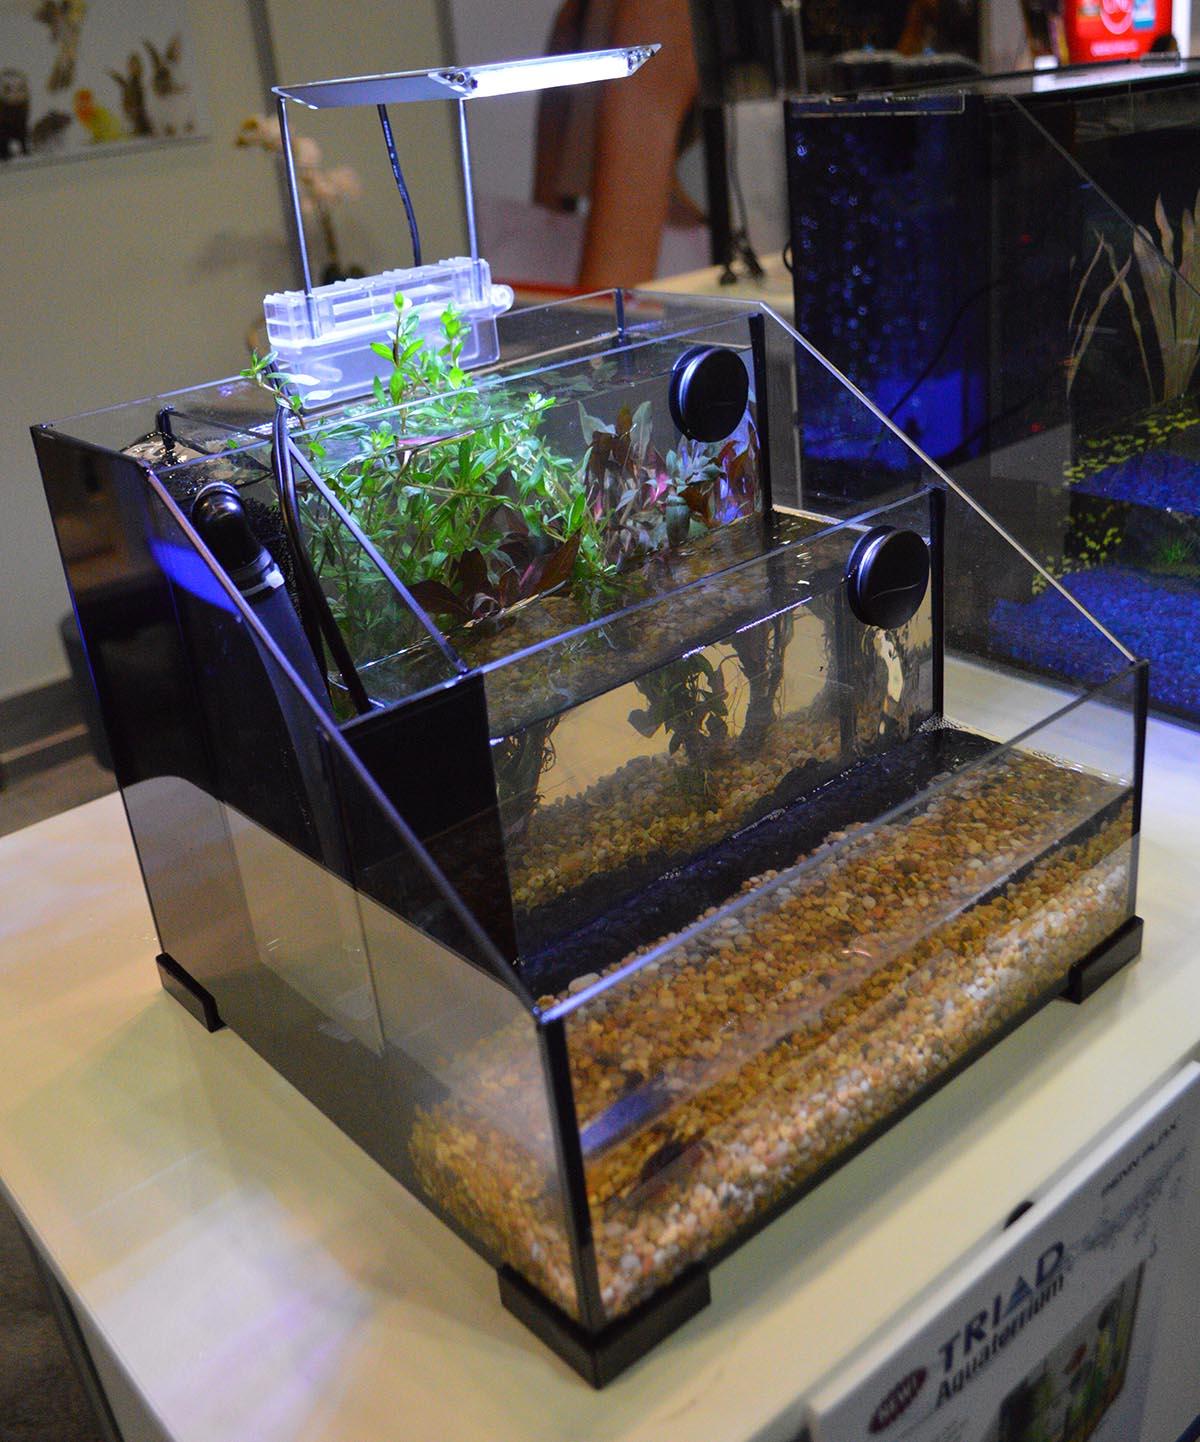 The new Triad Aquaterrarium from Penn-Plax unique take on the nano desktop aquarium.